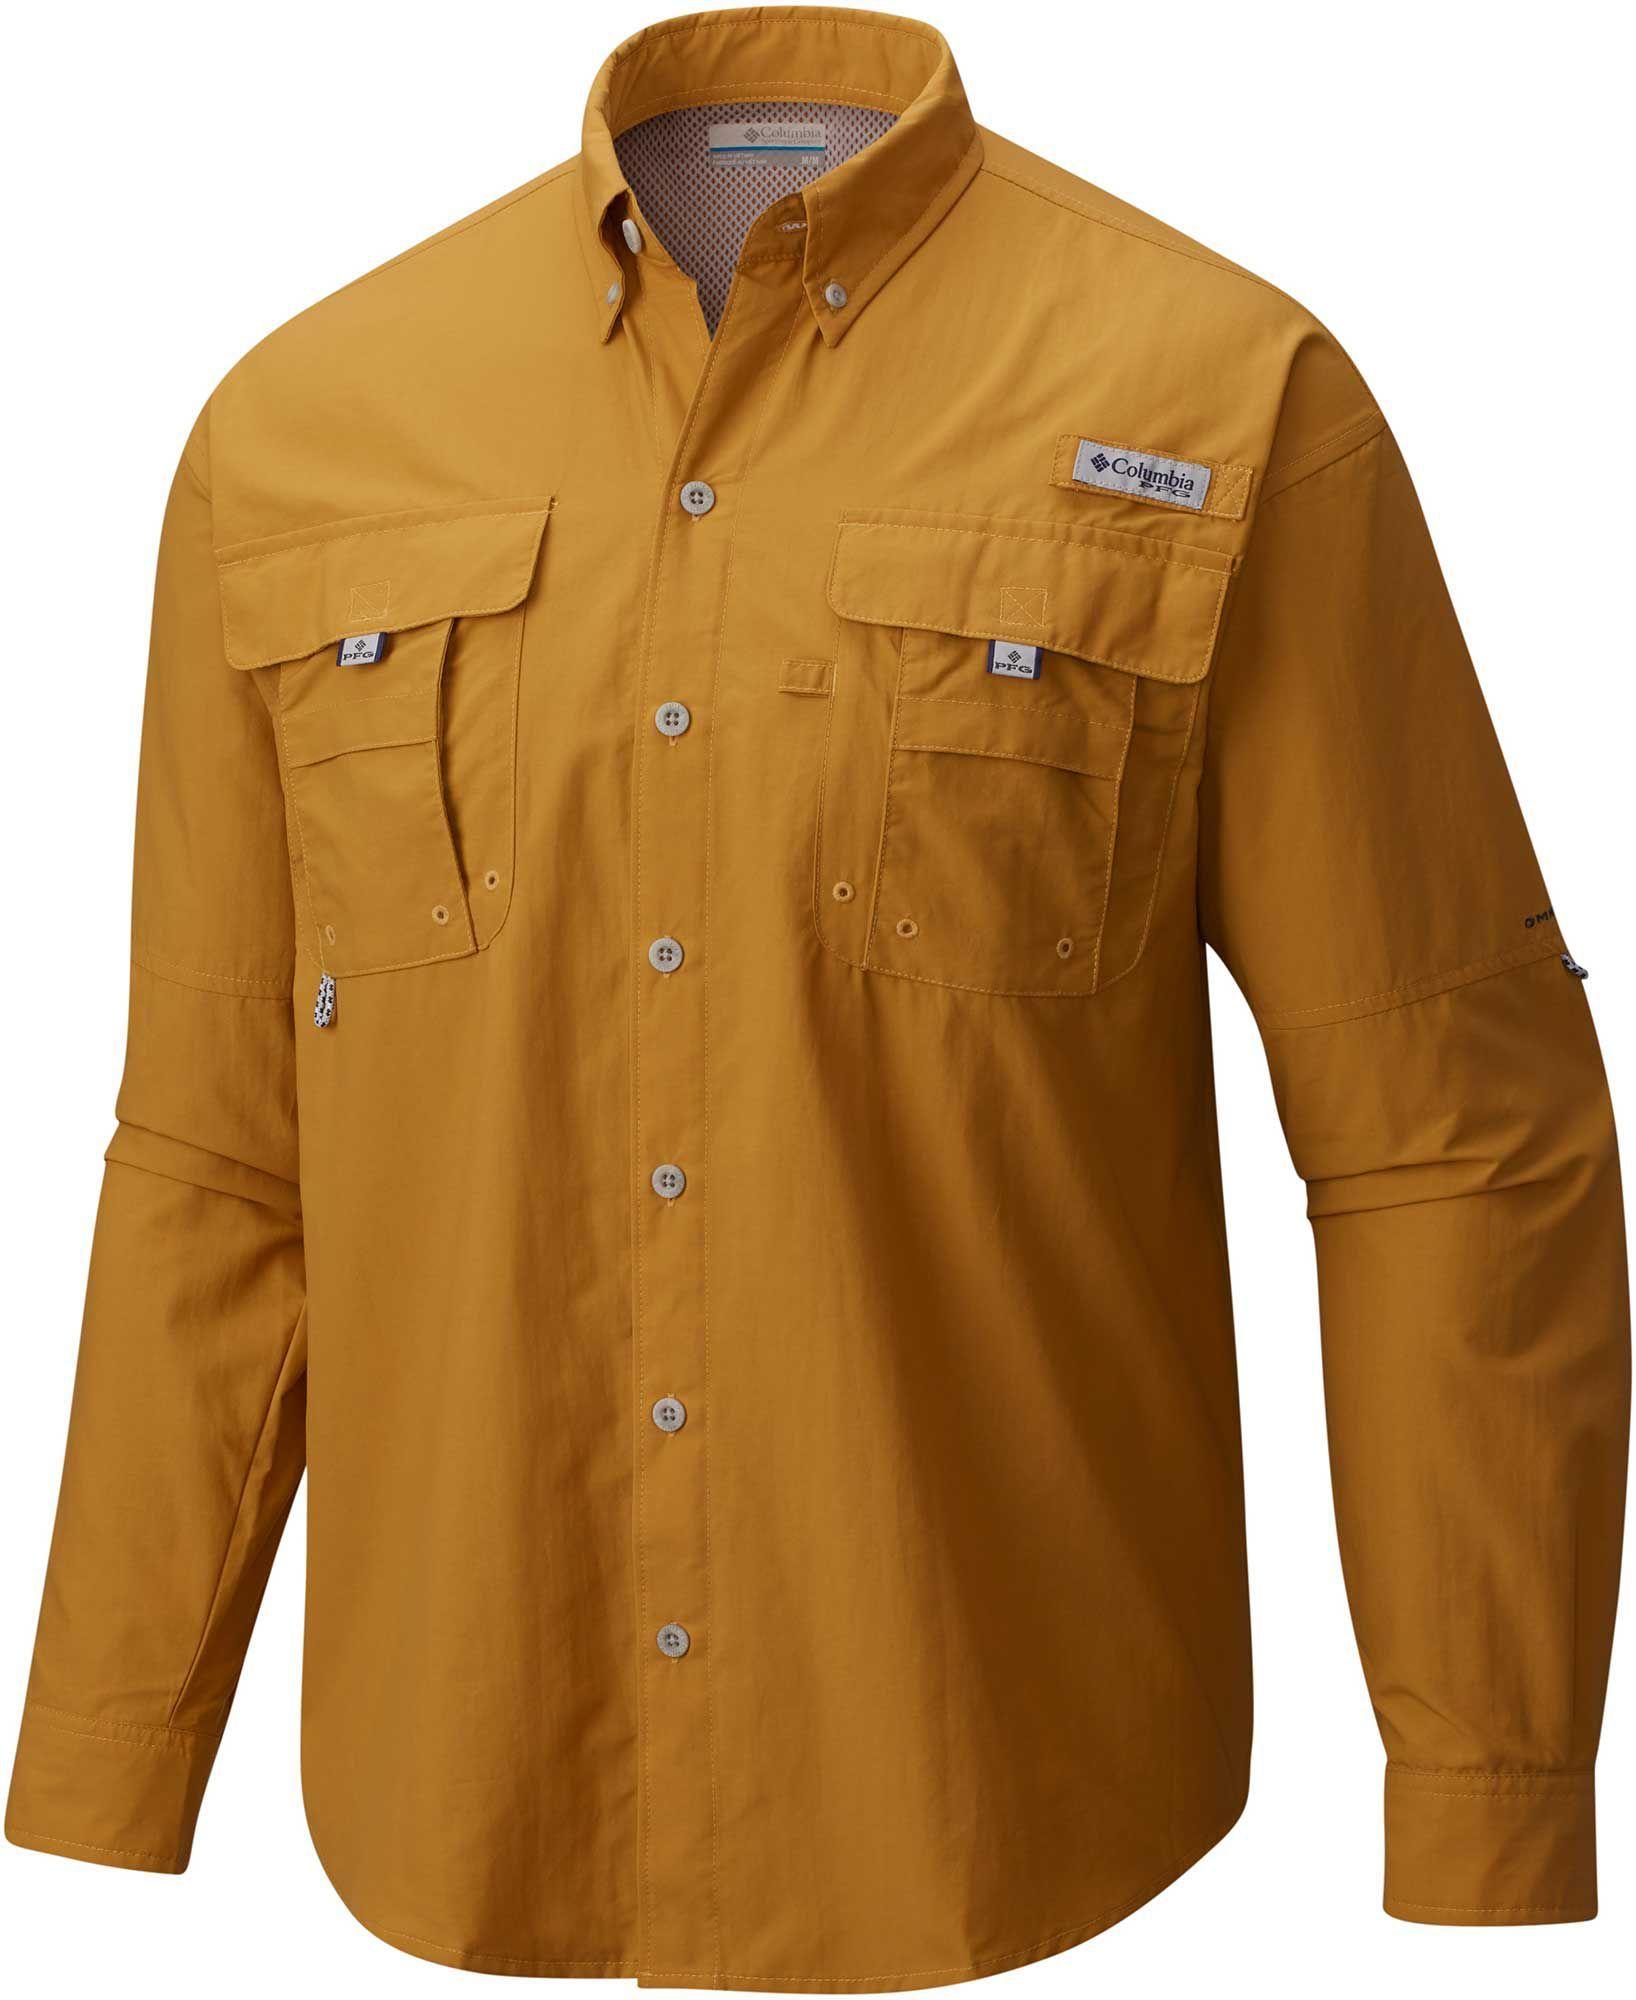 b953a942f08 Columbia Men's PFG Bahama Long Sleeve Shirt | Products | Long sleeve ...